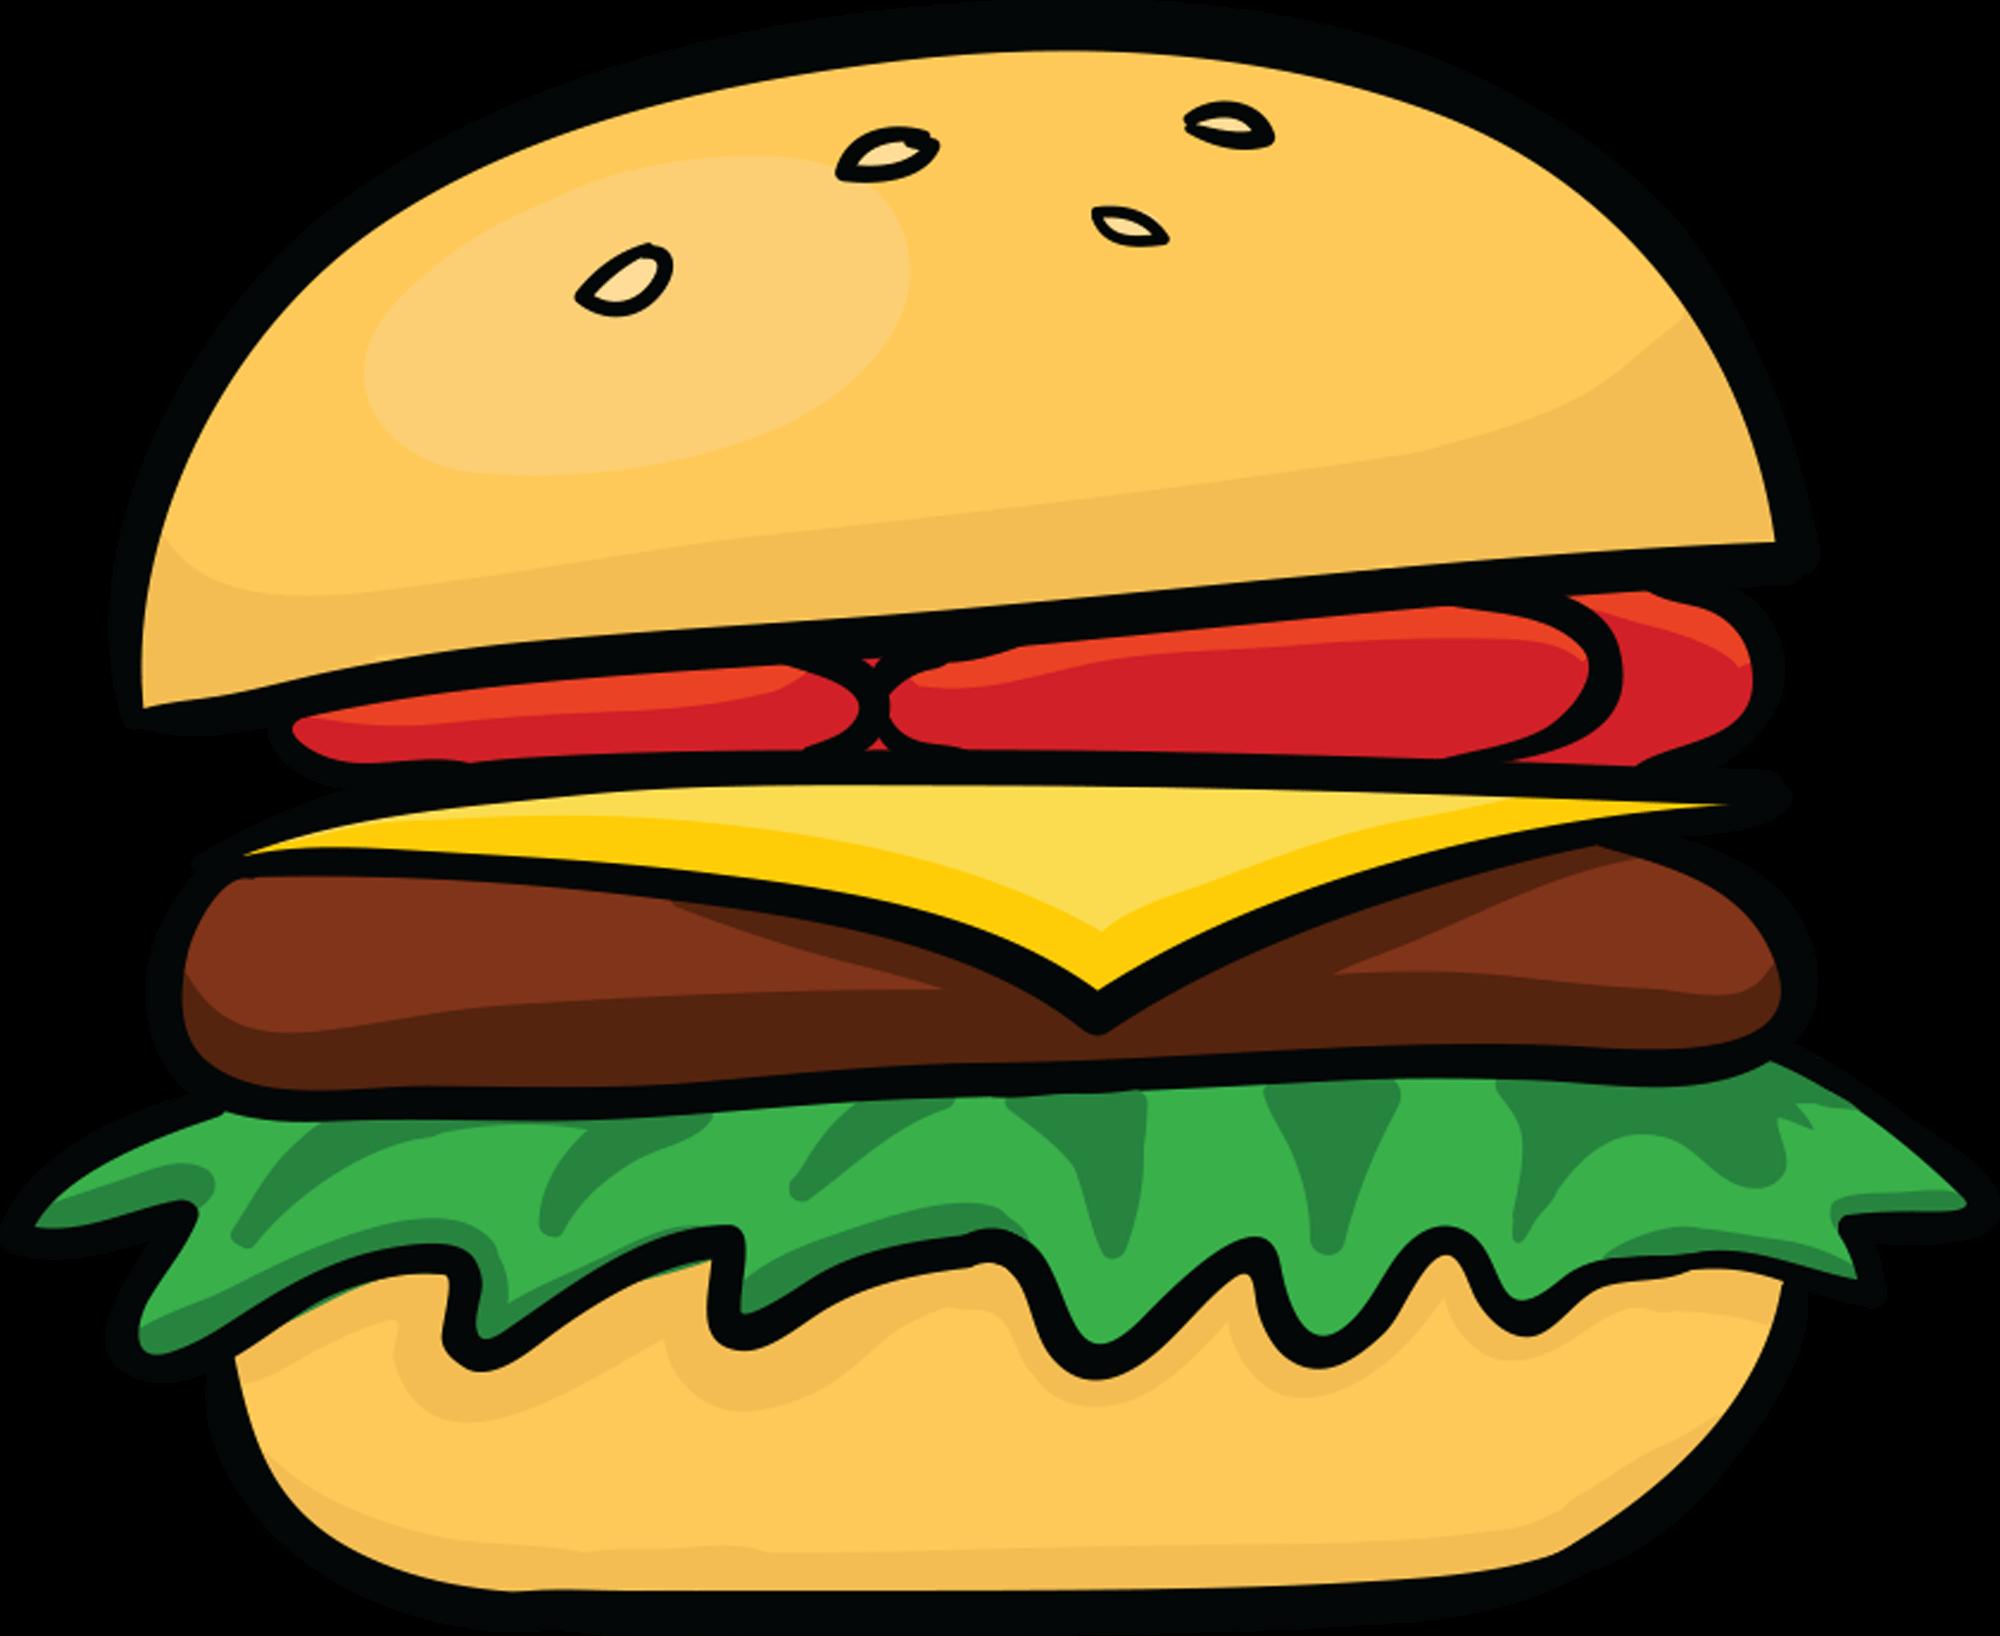 Junk Food Sticker & Emoji Pack for iMessage messages sticker-10